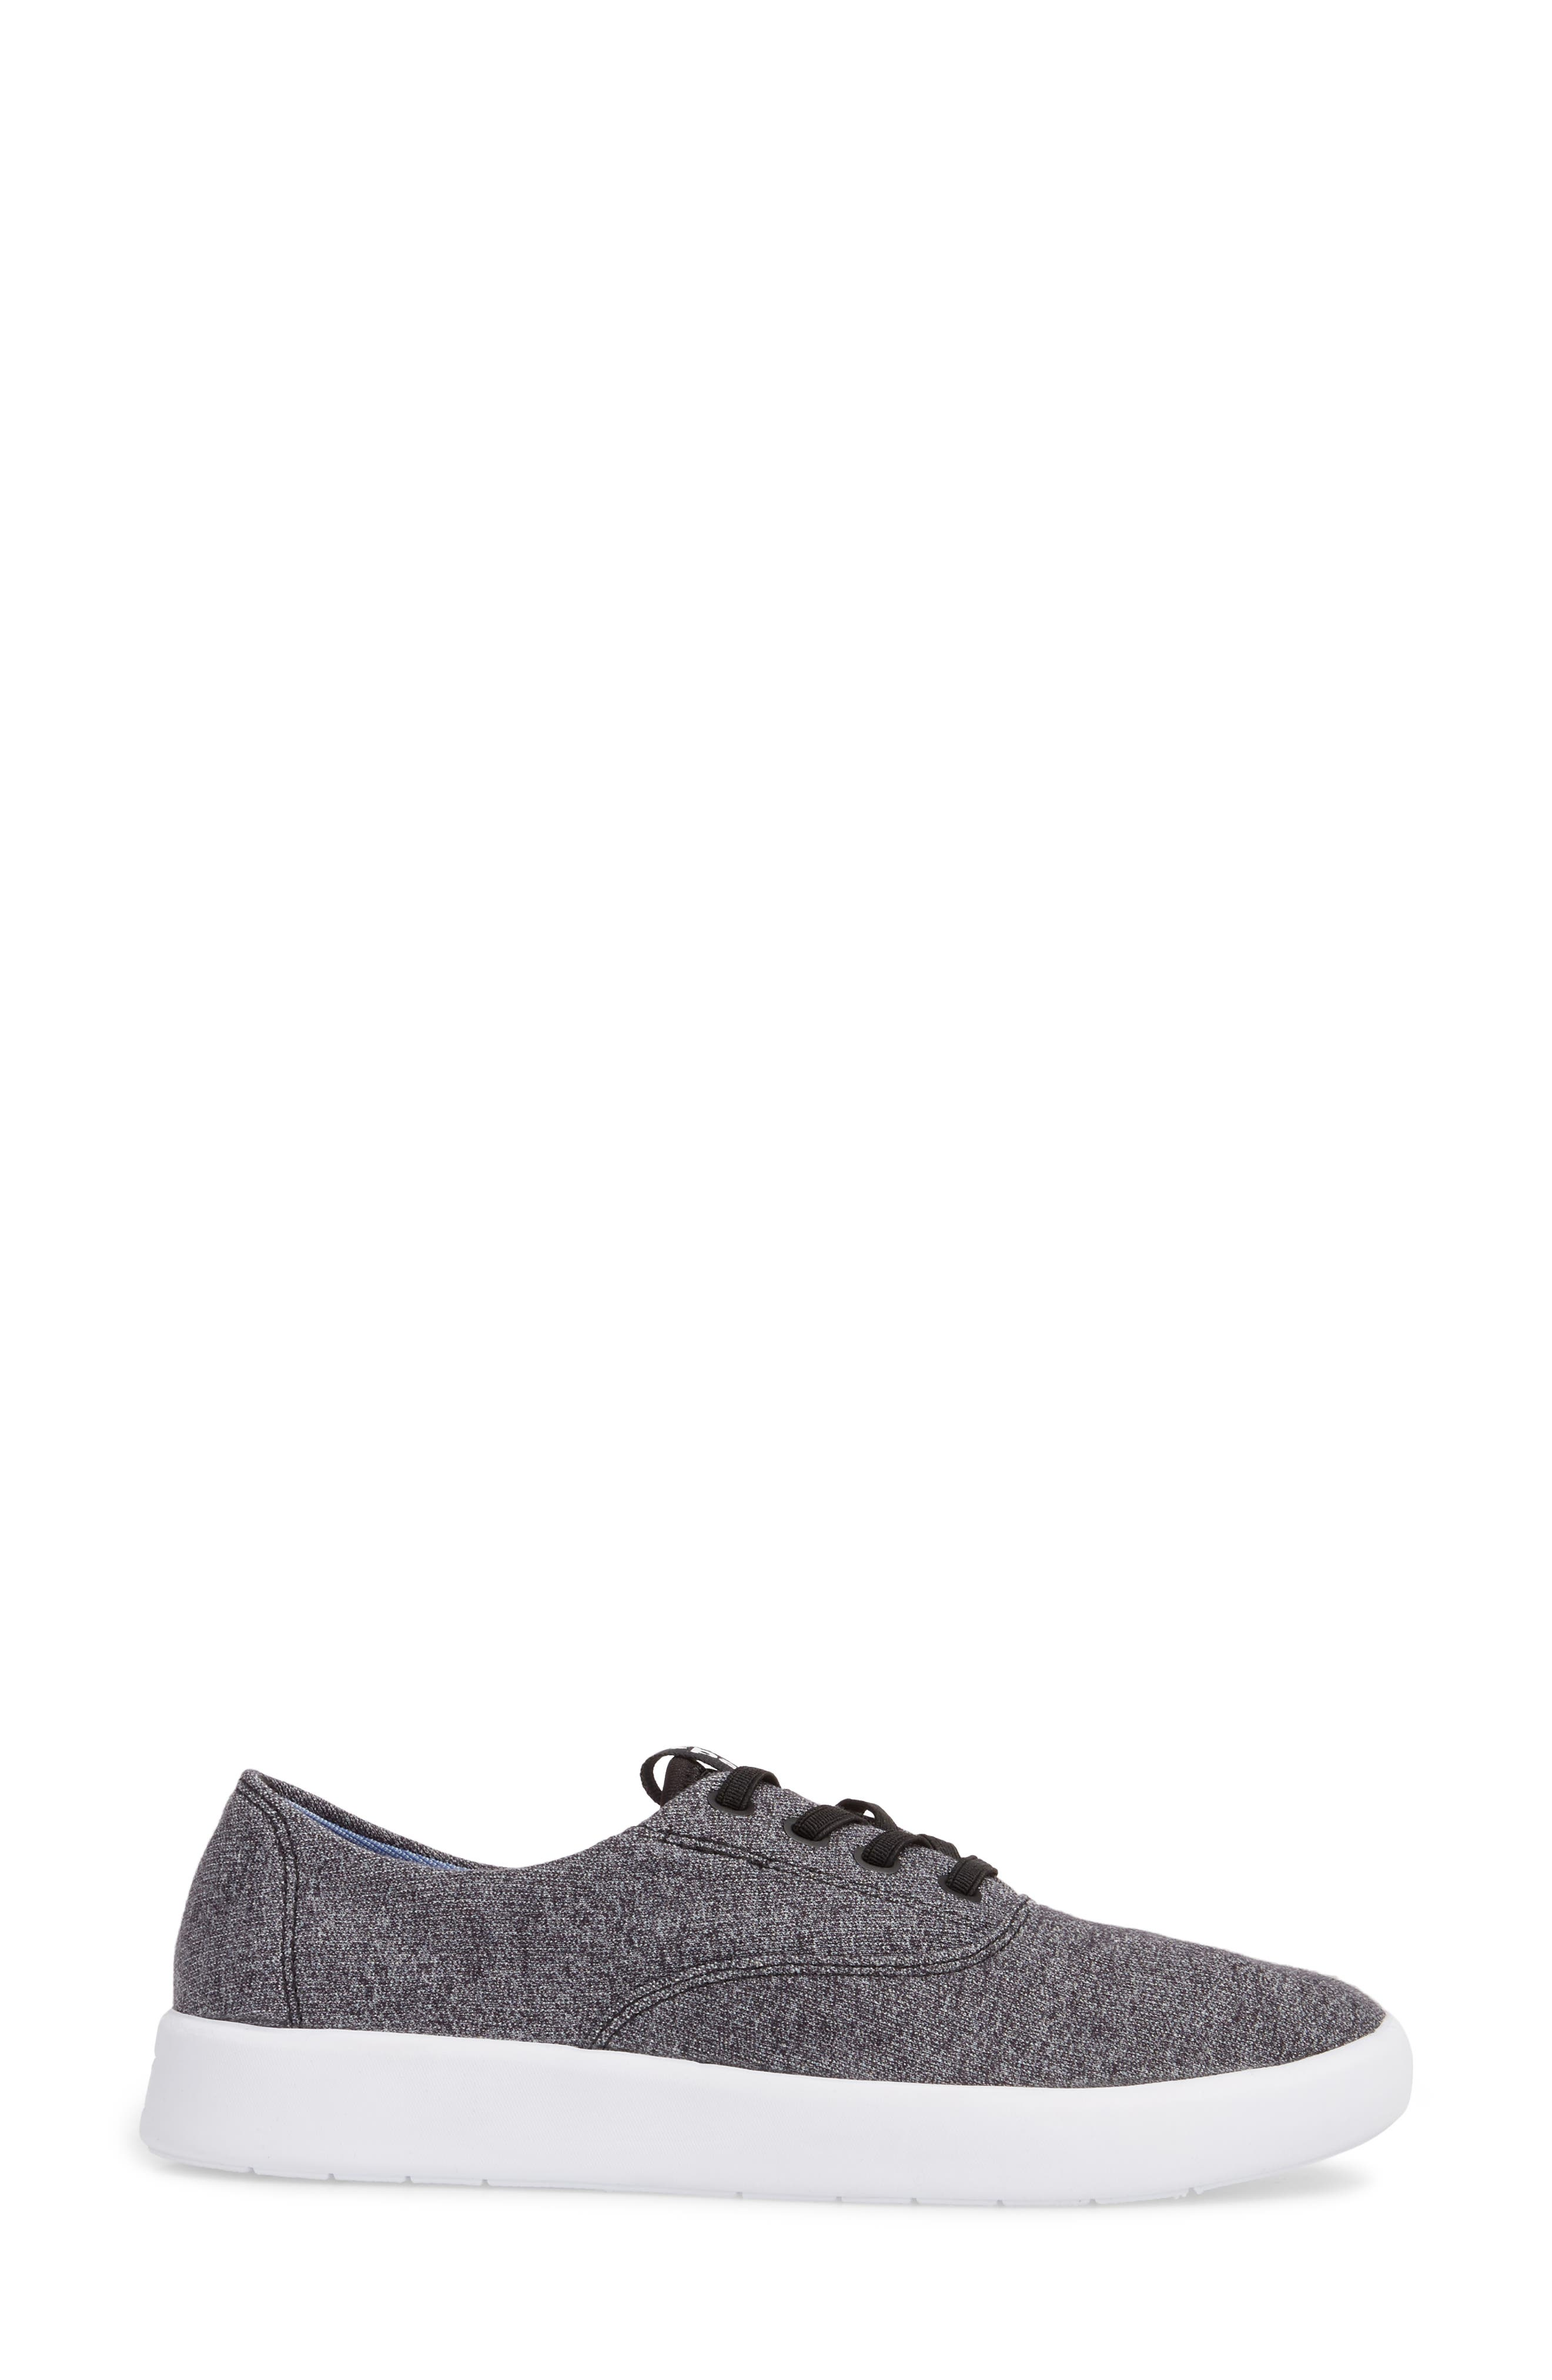 Studio Leap Sneaker,                             Alternate thumbnail 3, color,                             Charcoal